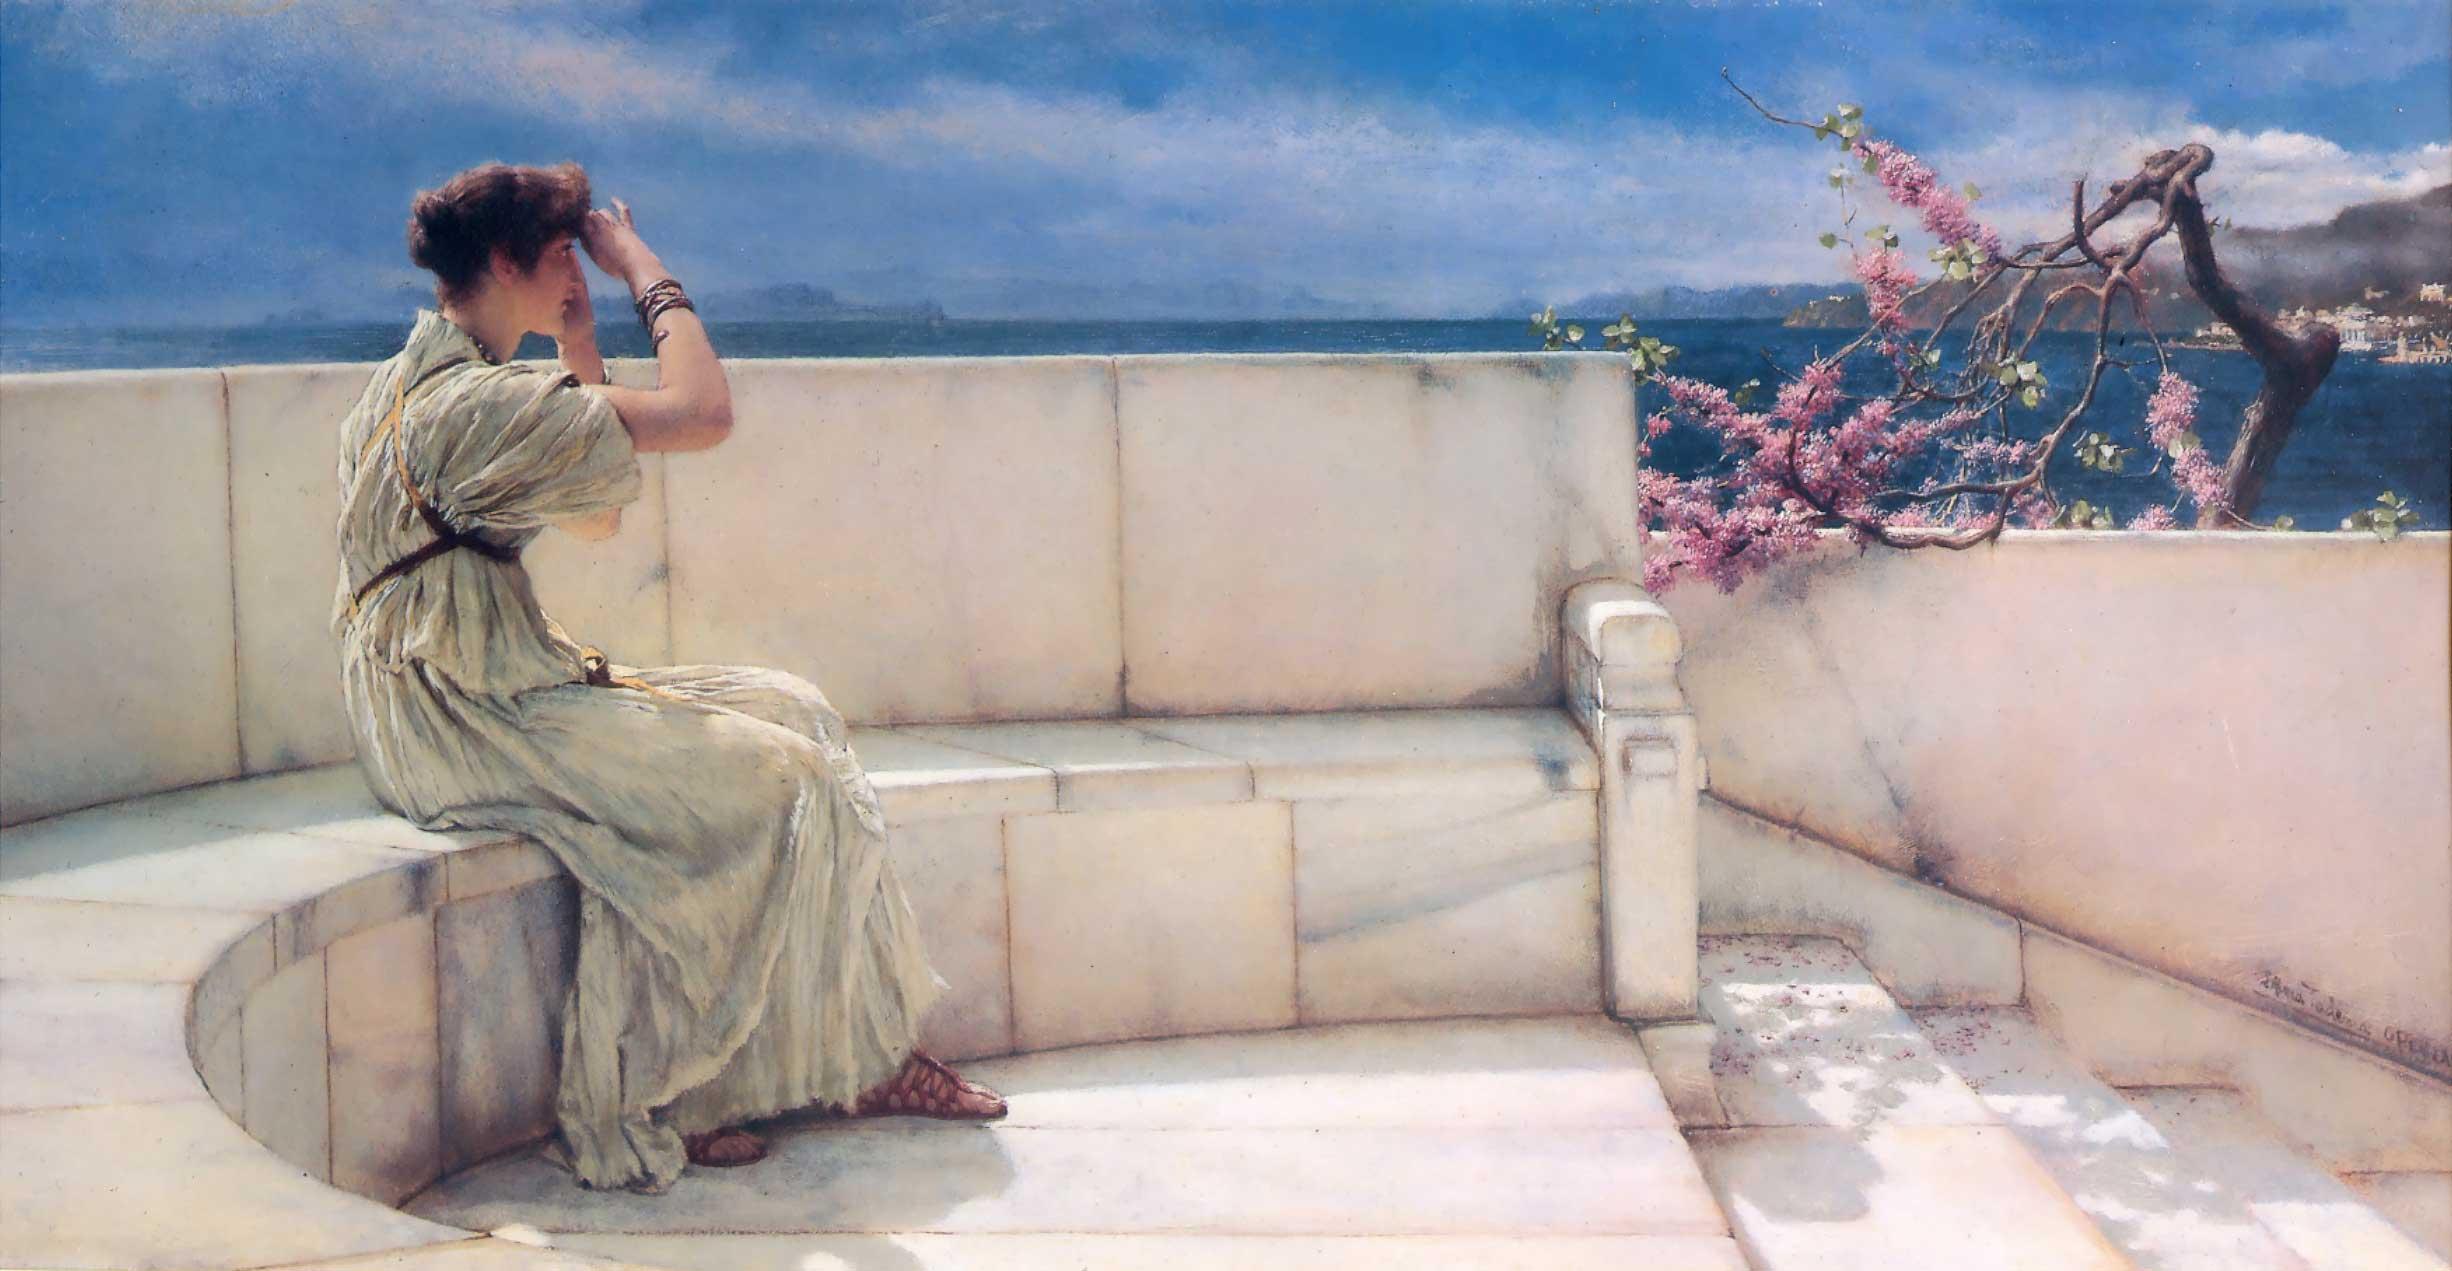 Lawrence Alma-Tadema - Page 2 LawrenceAlmaTadema-Expectations-1885